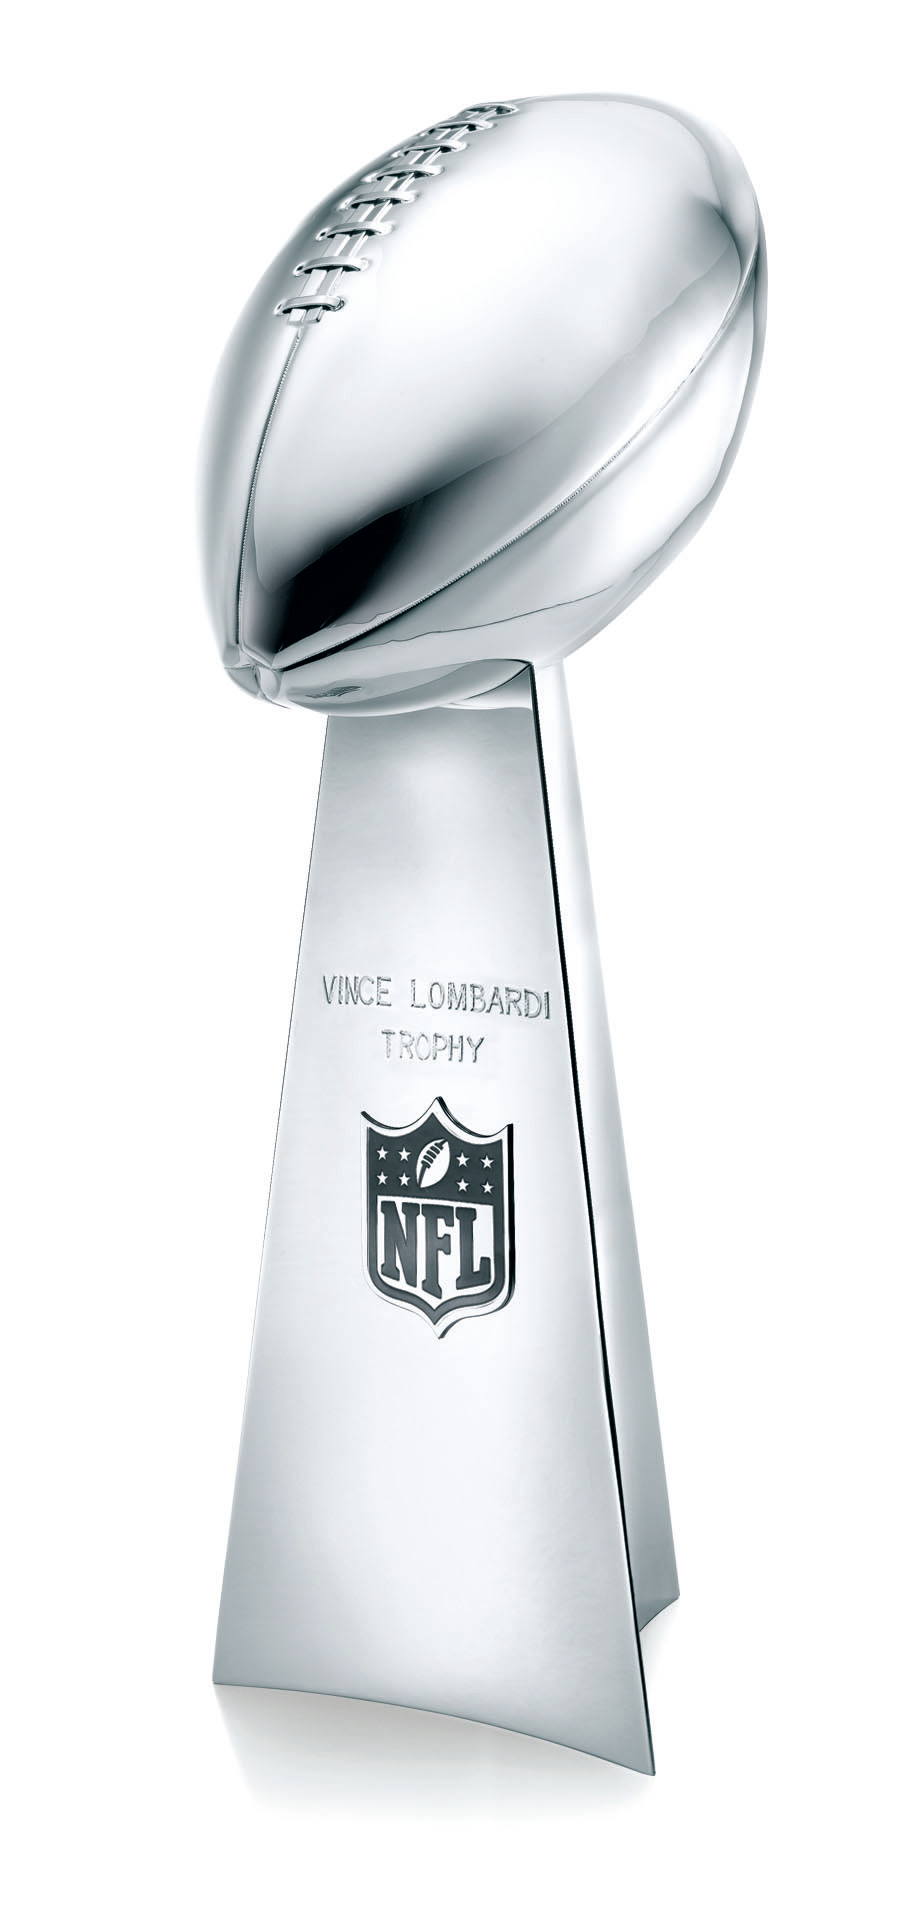 Pin By Maxsouza On Montagem 2019 Super Bowl Trophy Lombardi Trophy Vince Lombardi